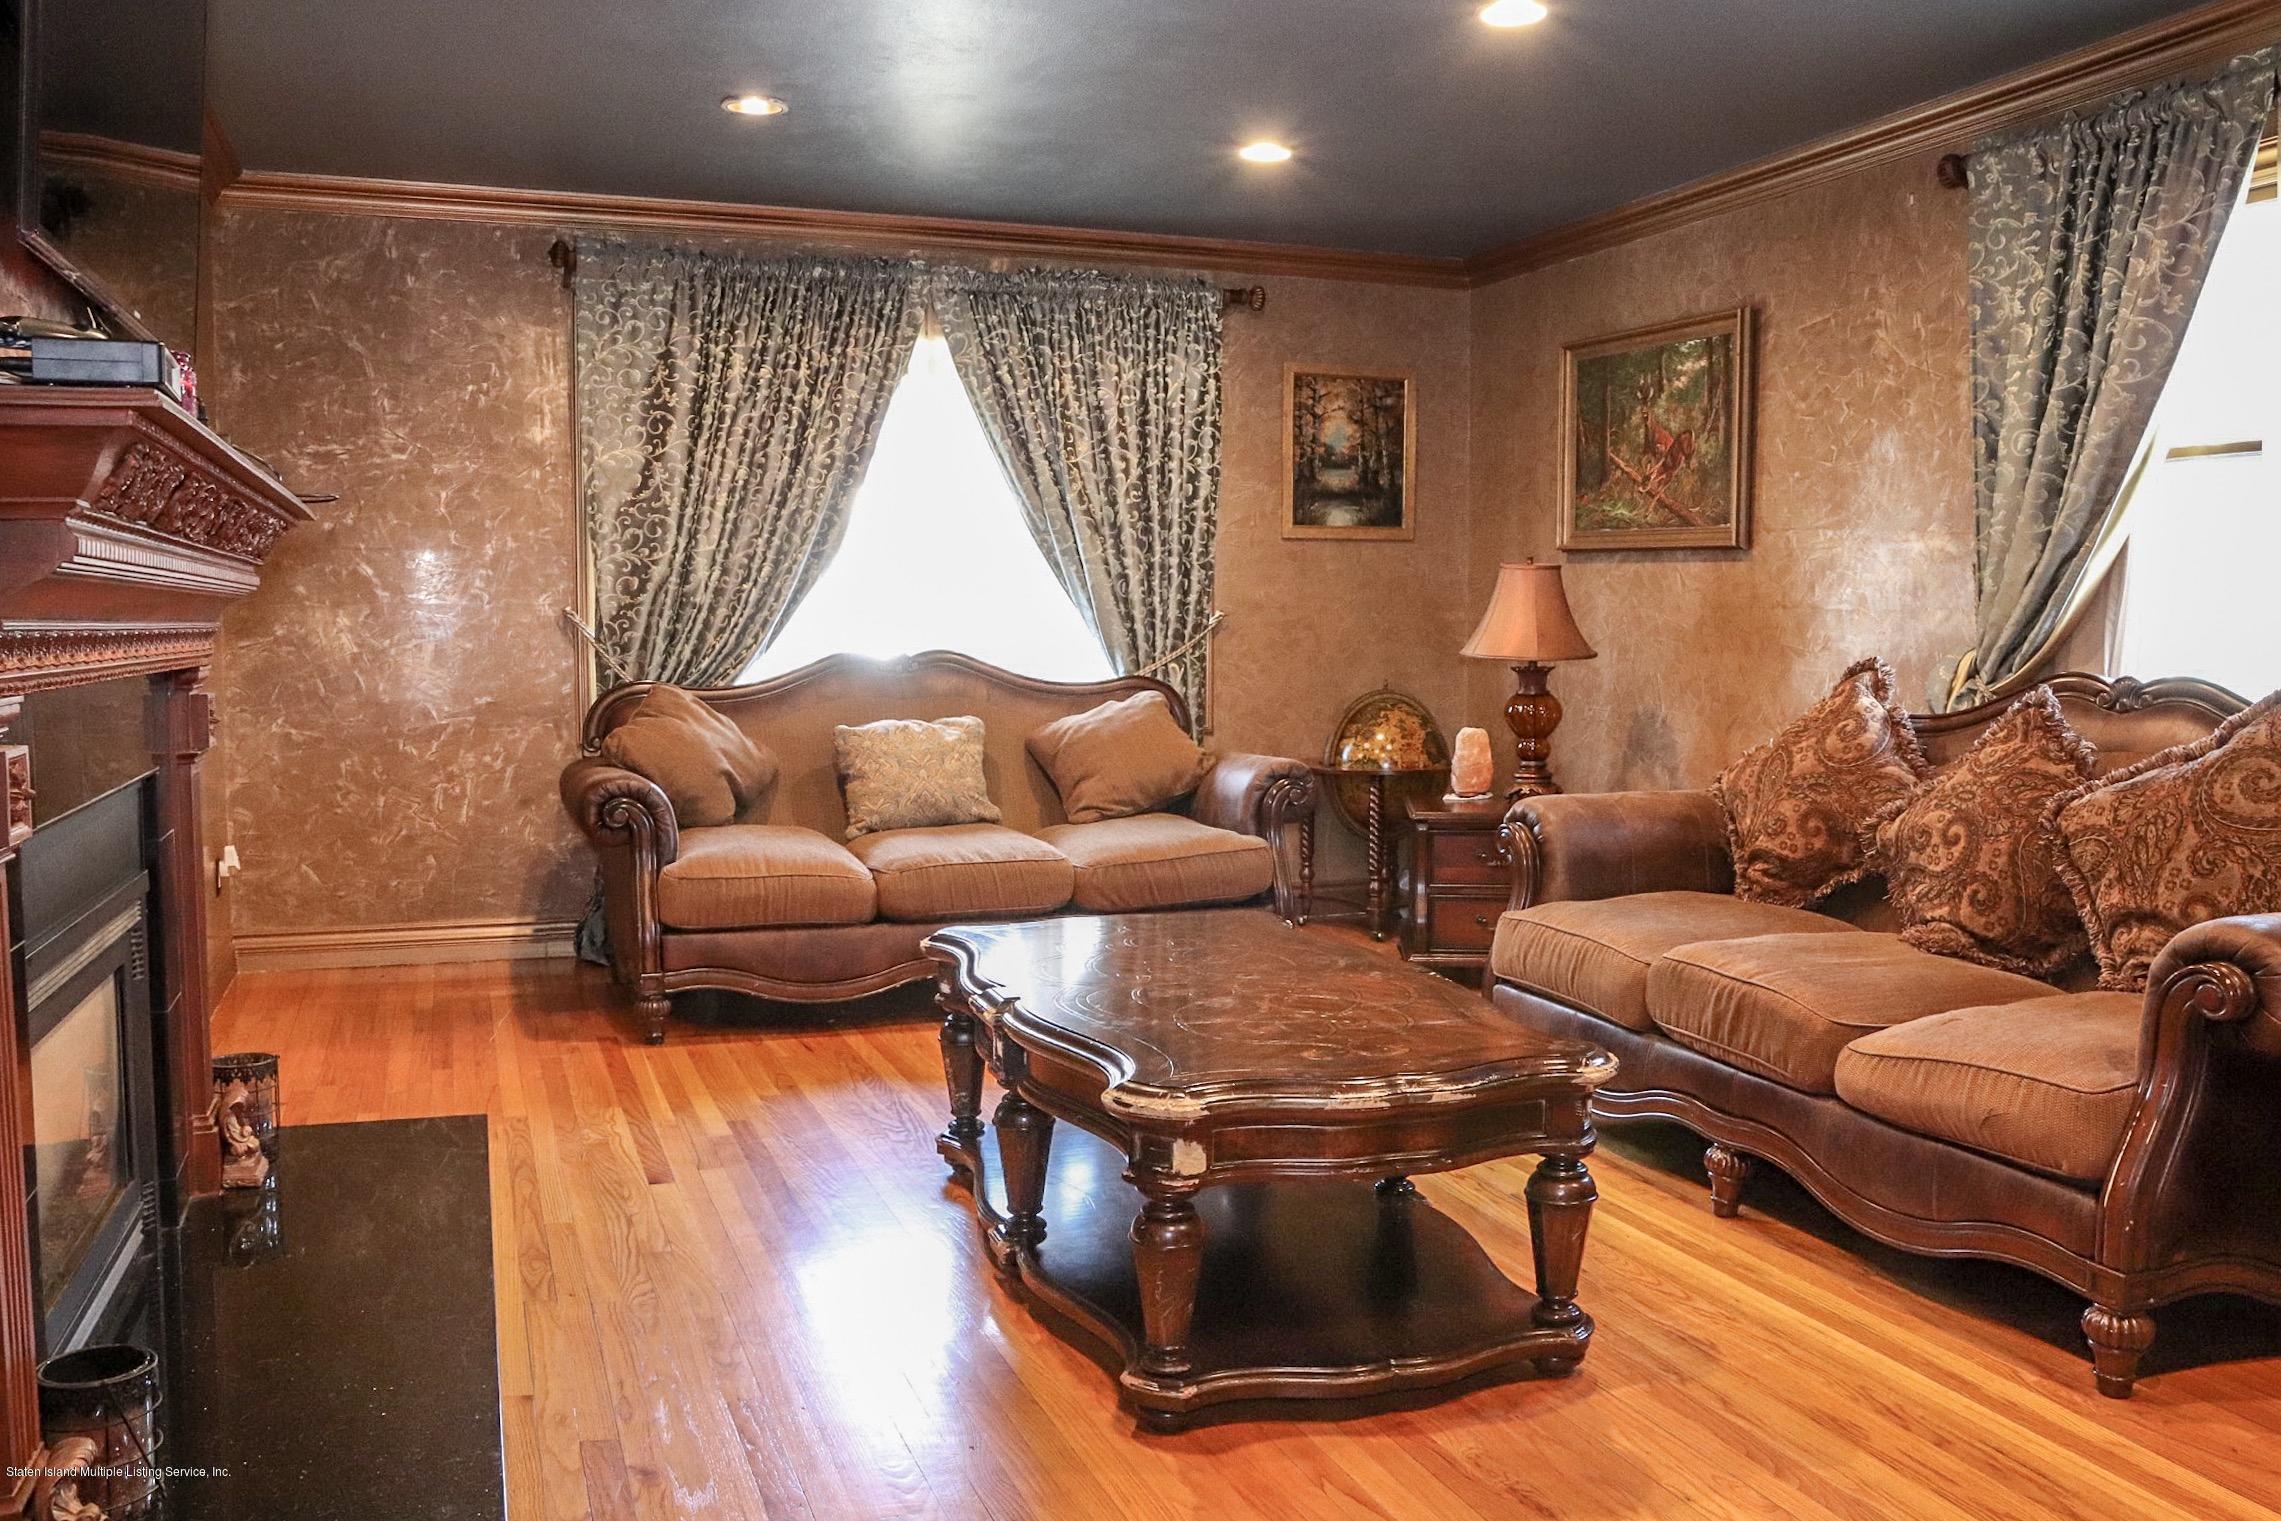 Single Family - Detached 15 Butterworth Avenue  Staten Island, NY 10301, MLS-1127612-6